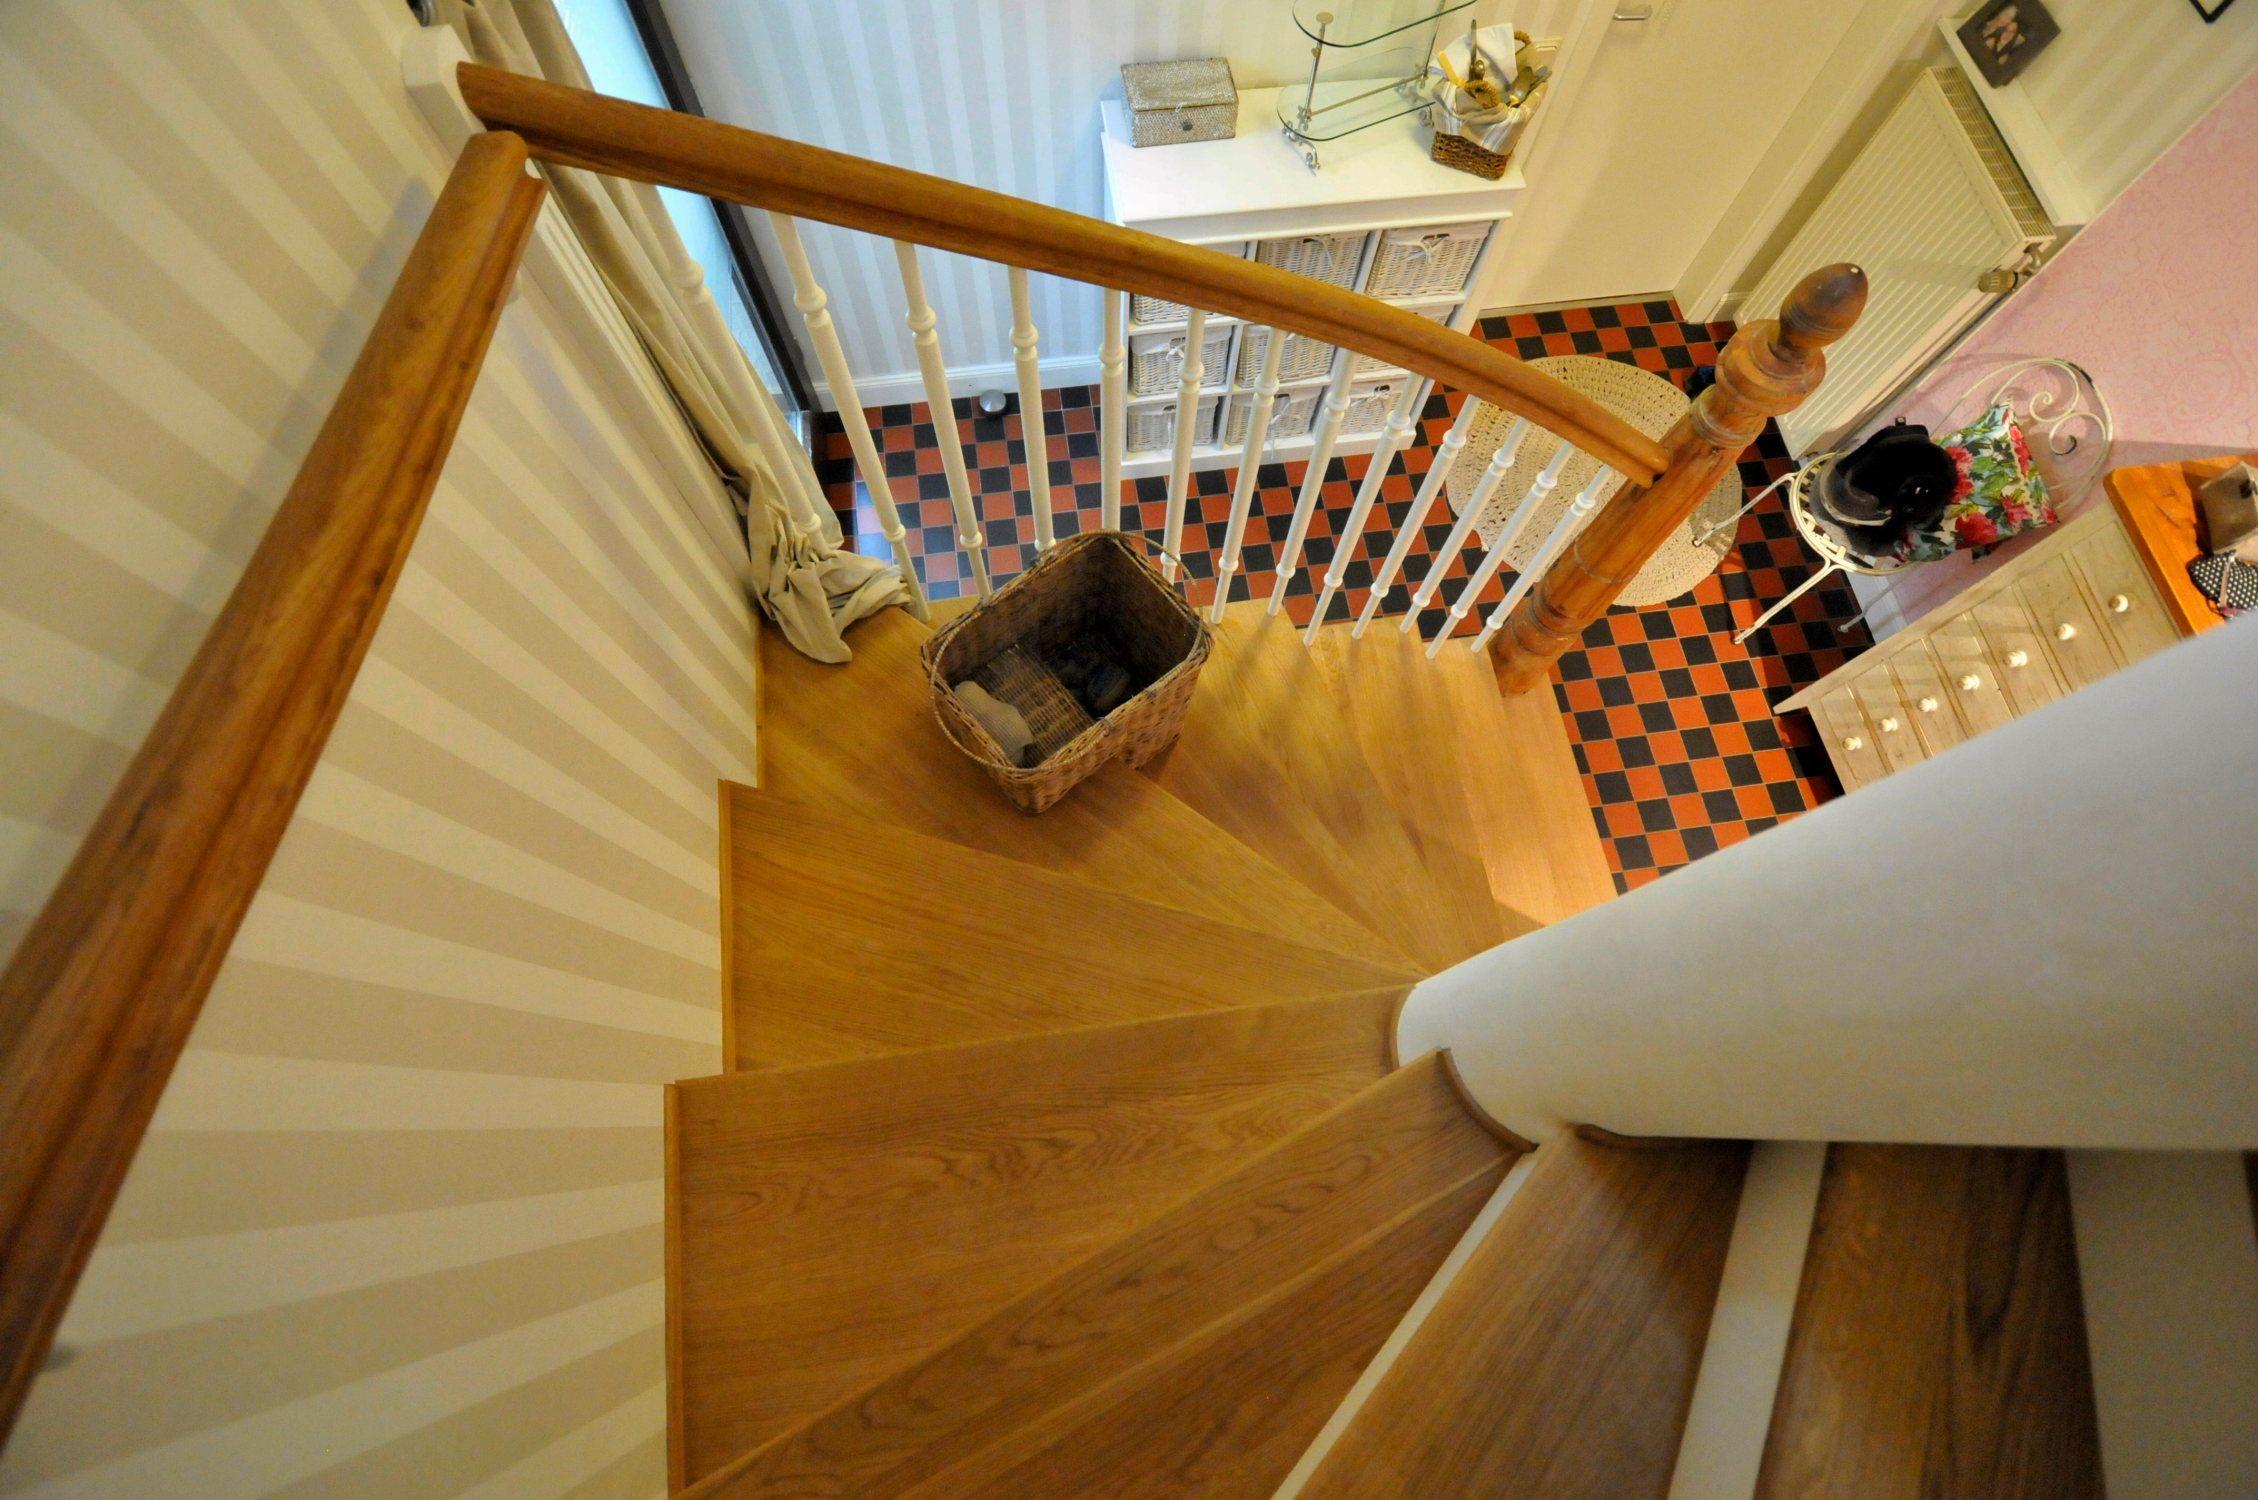 betontreppe holz-16_4 | treppe | pinterest | treppe, holz und